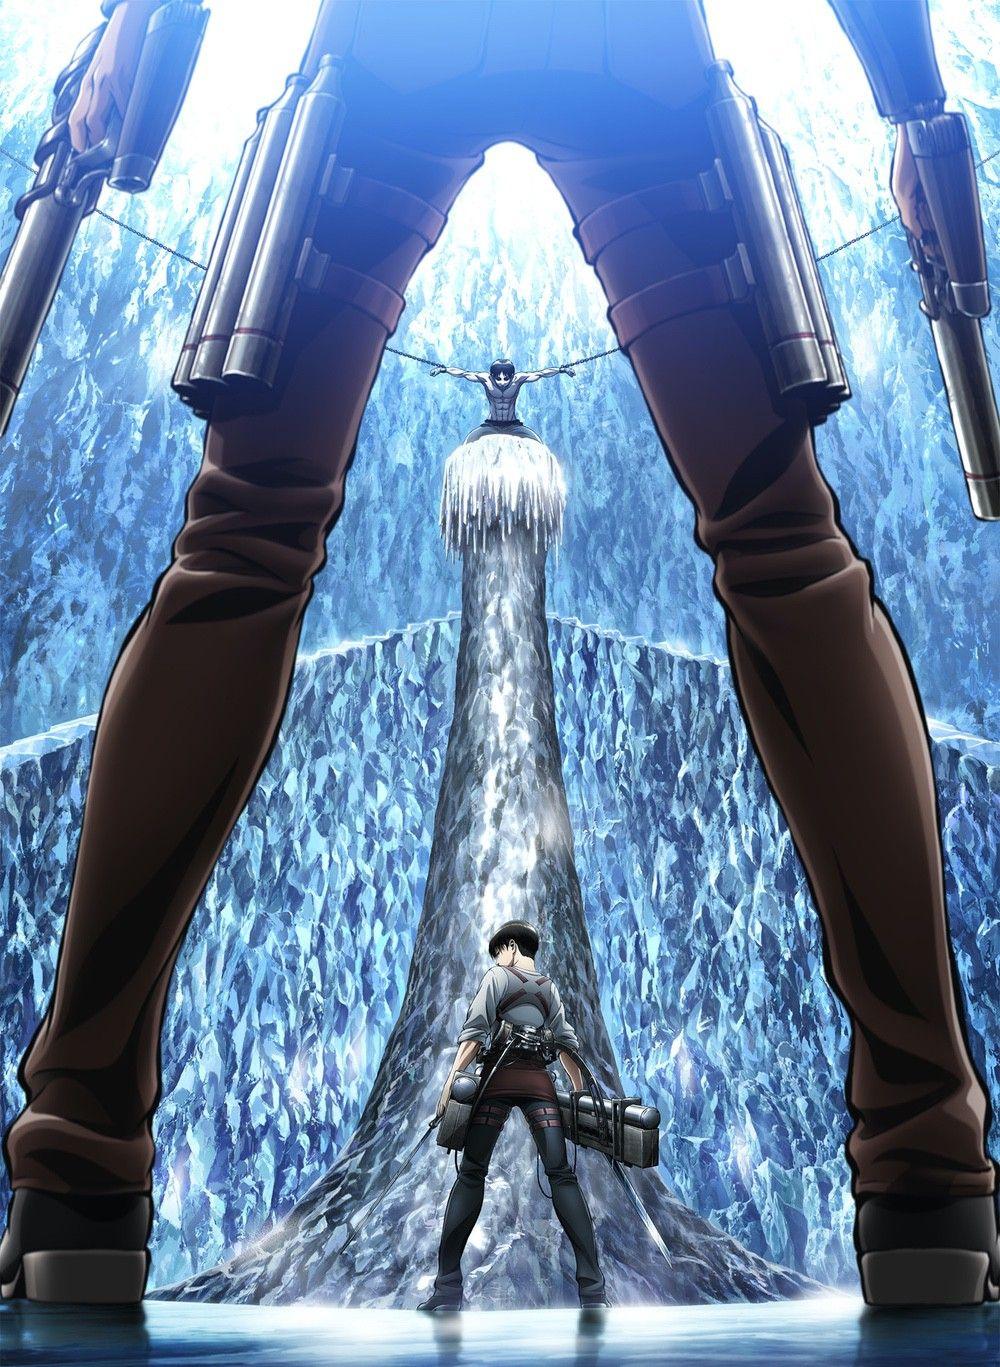 Attack On Titan Season 3 Official Visual 1 進撃の巨人、巨人、進撃の